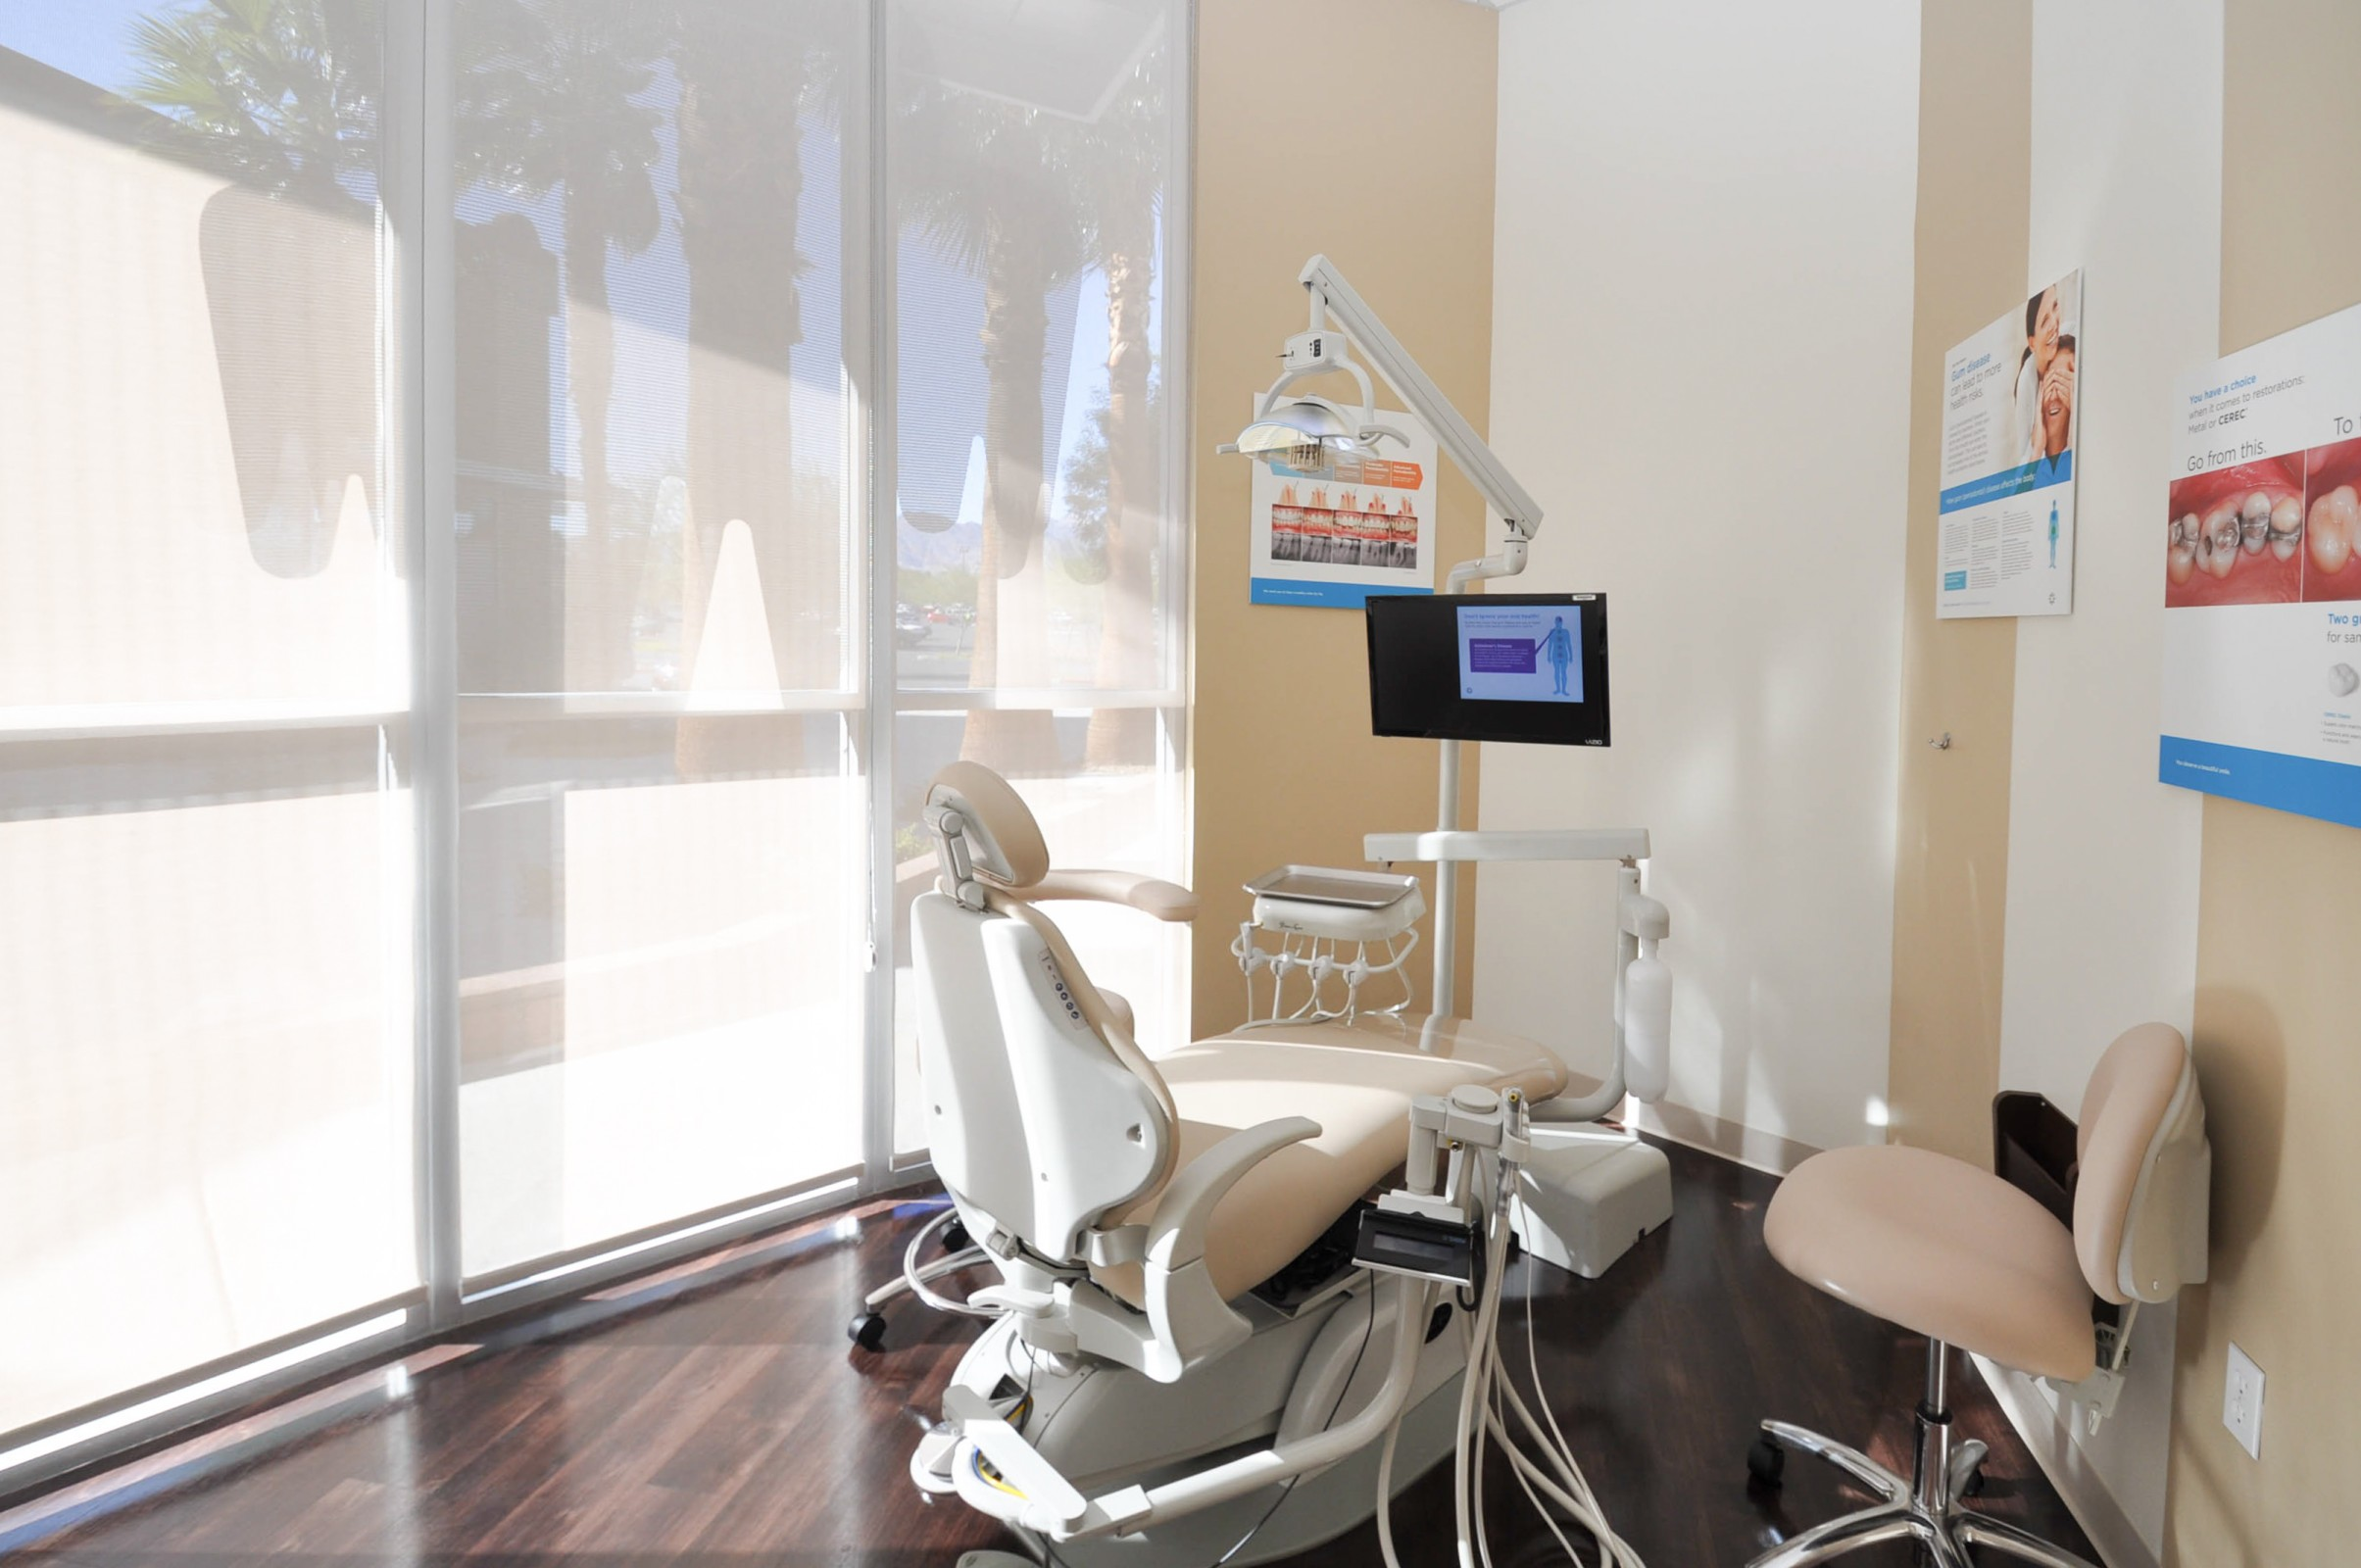 Centennial Modern Dentistry and Orthodontics image 4